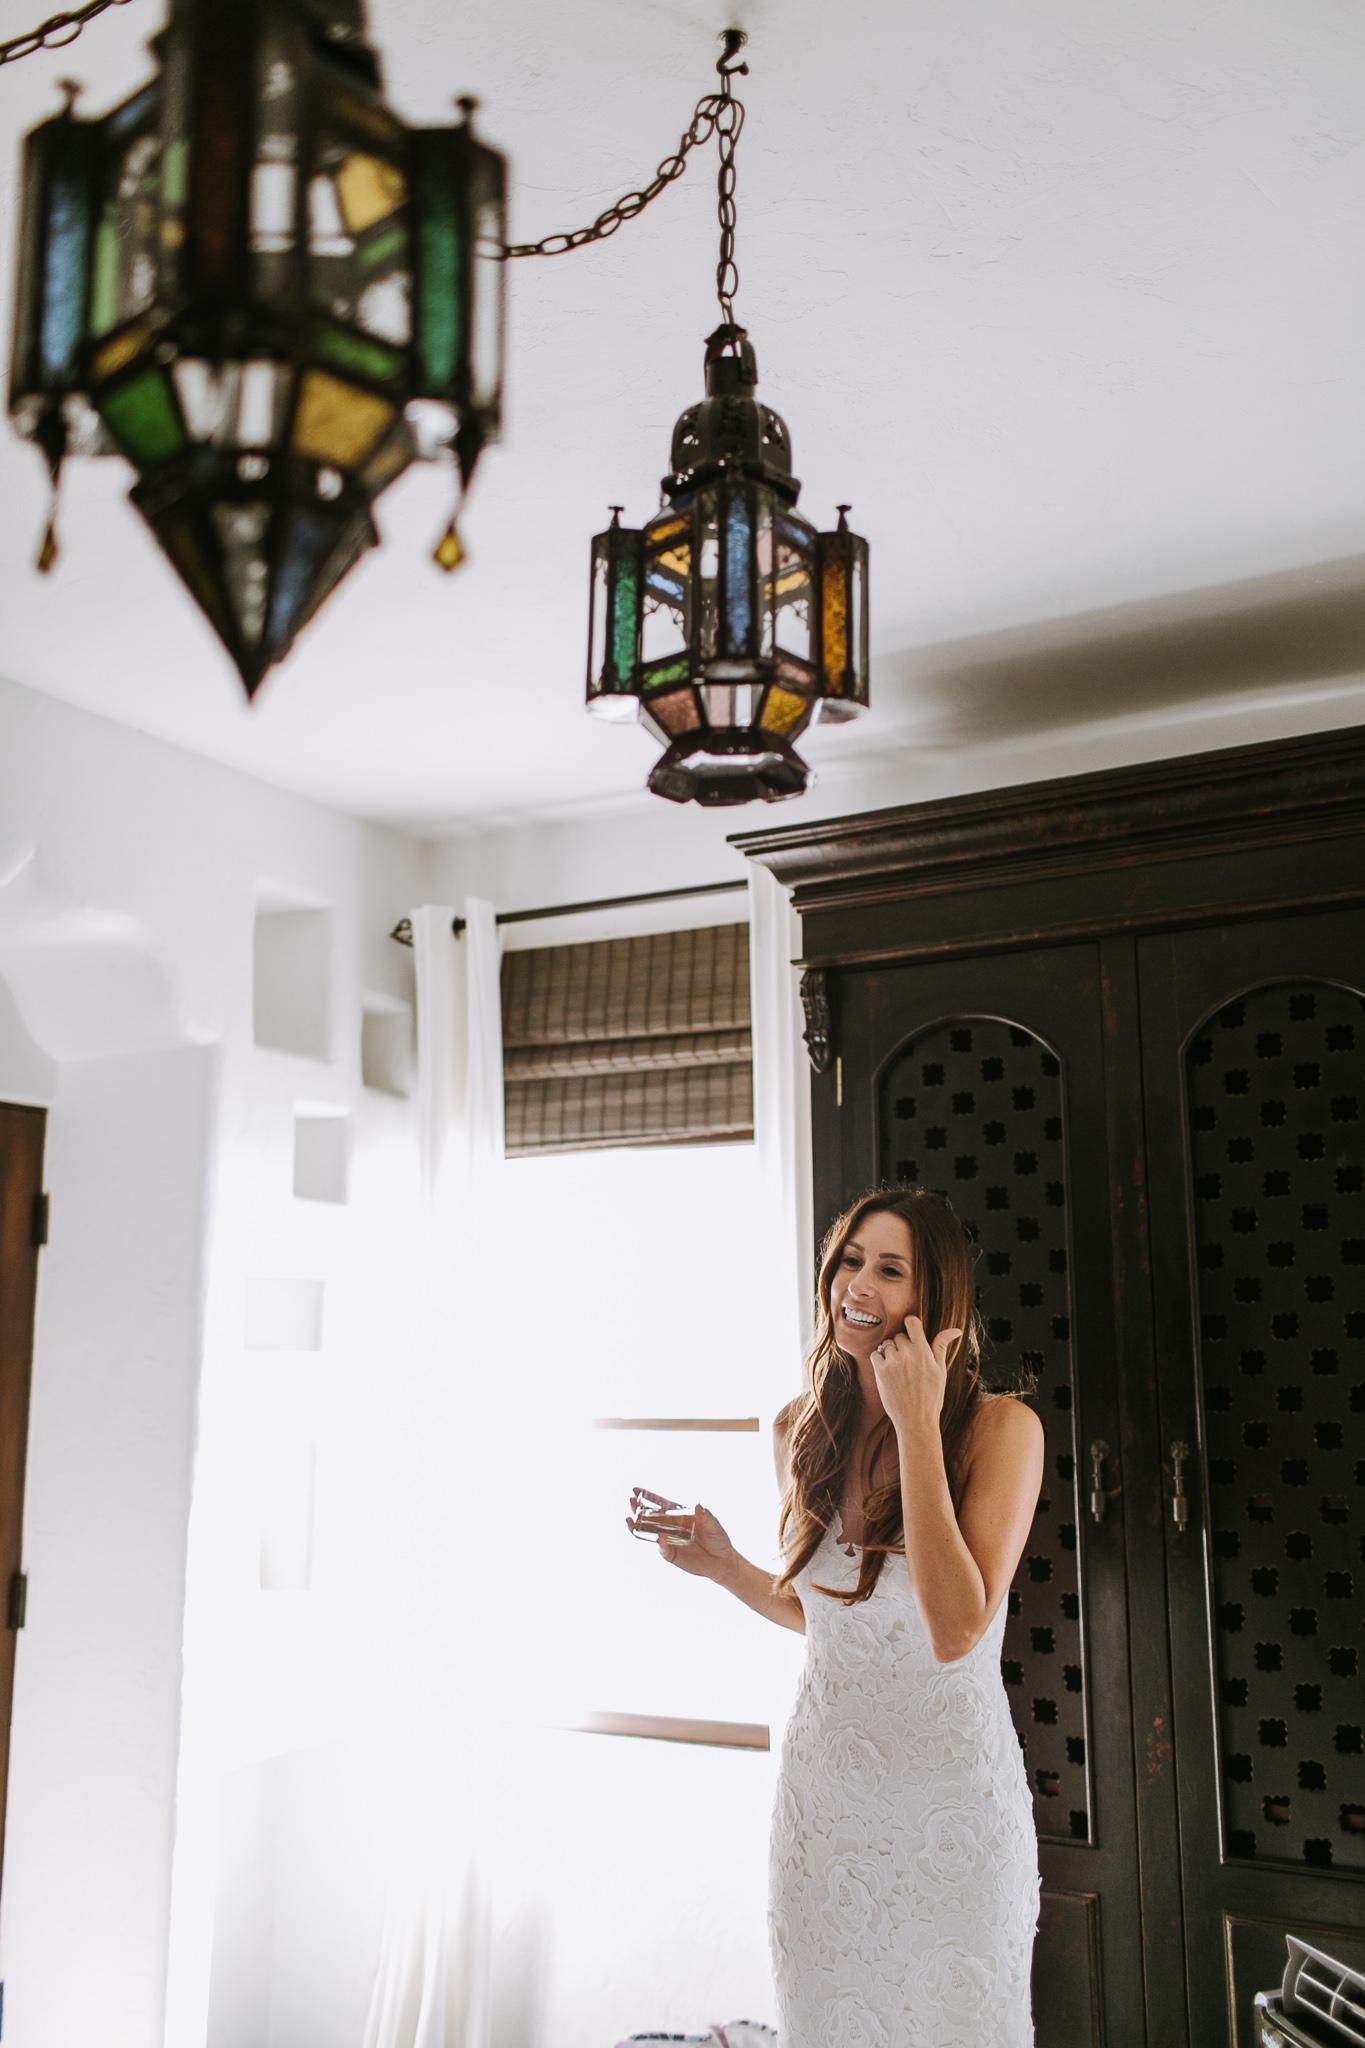 LagunaBeach-WeddingPhotographer-29.jpg